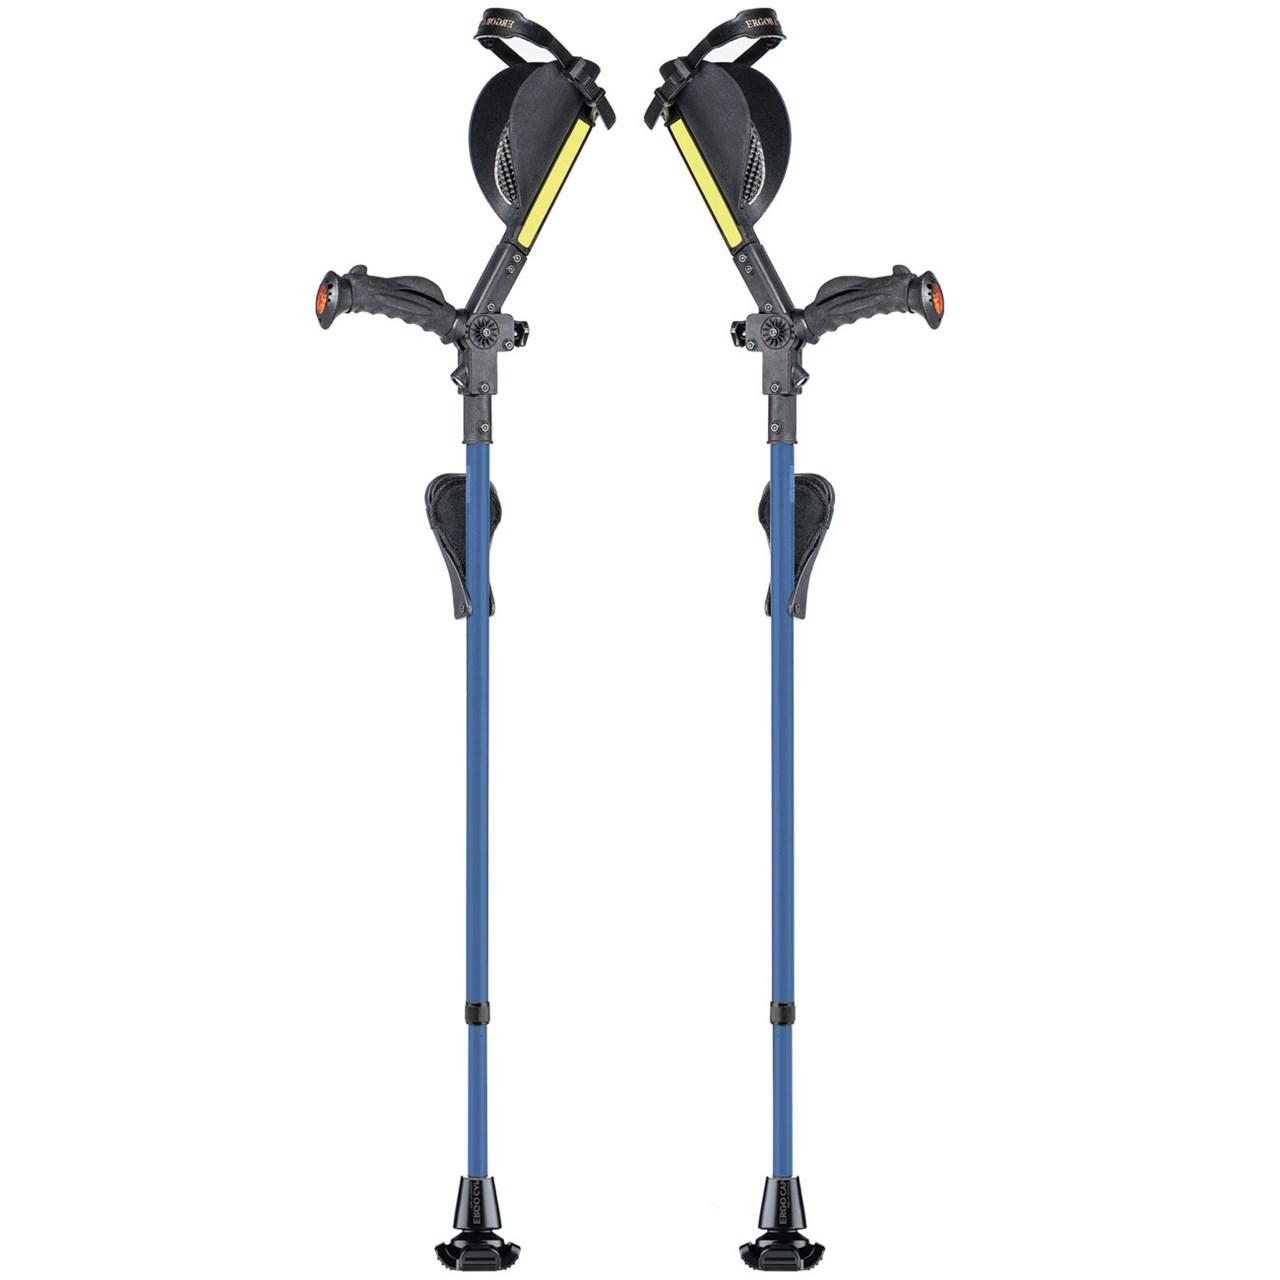 Ergobaum Ergonomic Forearm Crutches - Adult - Blue